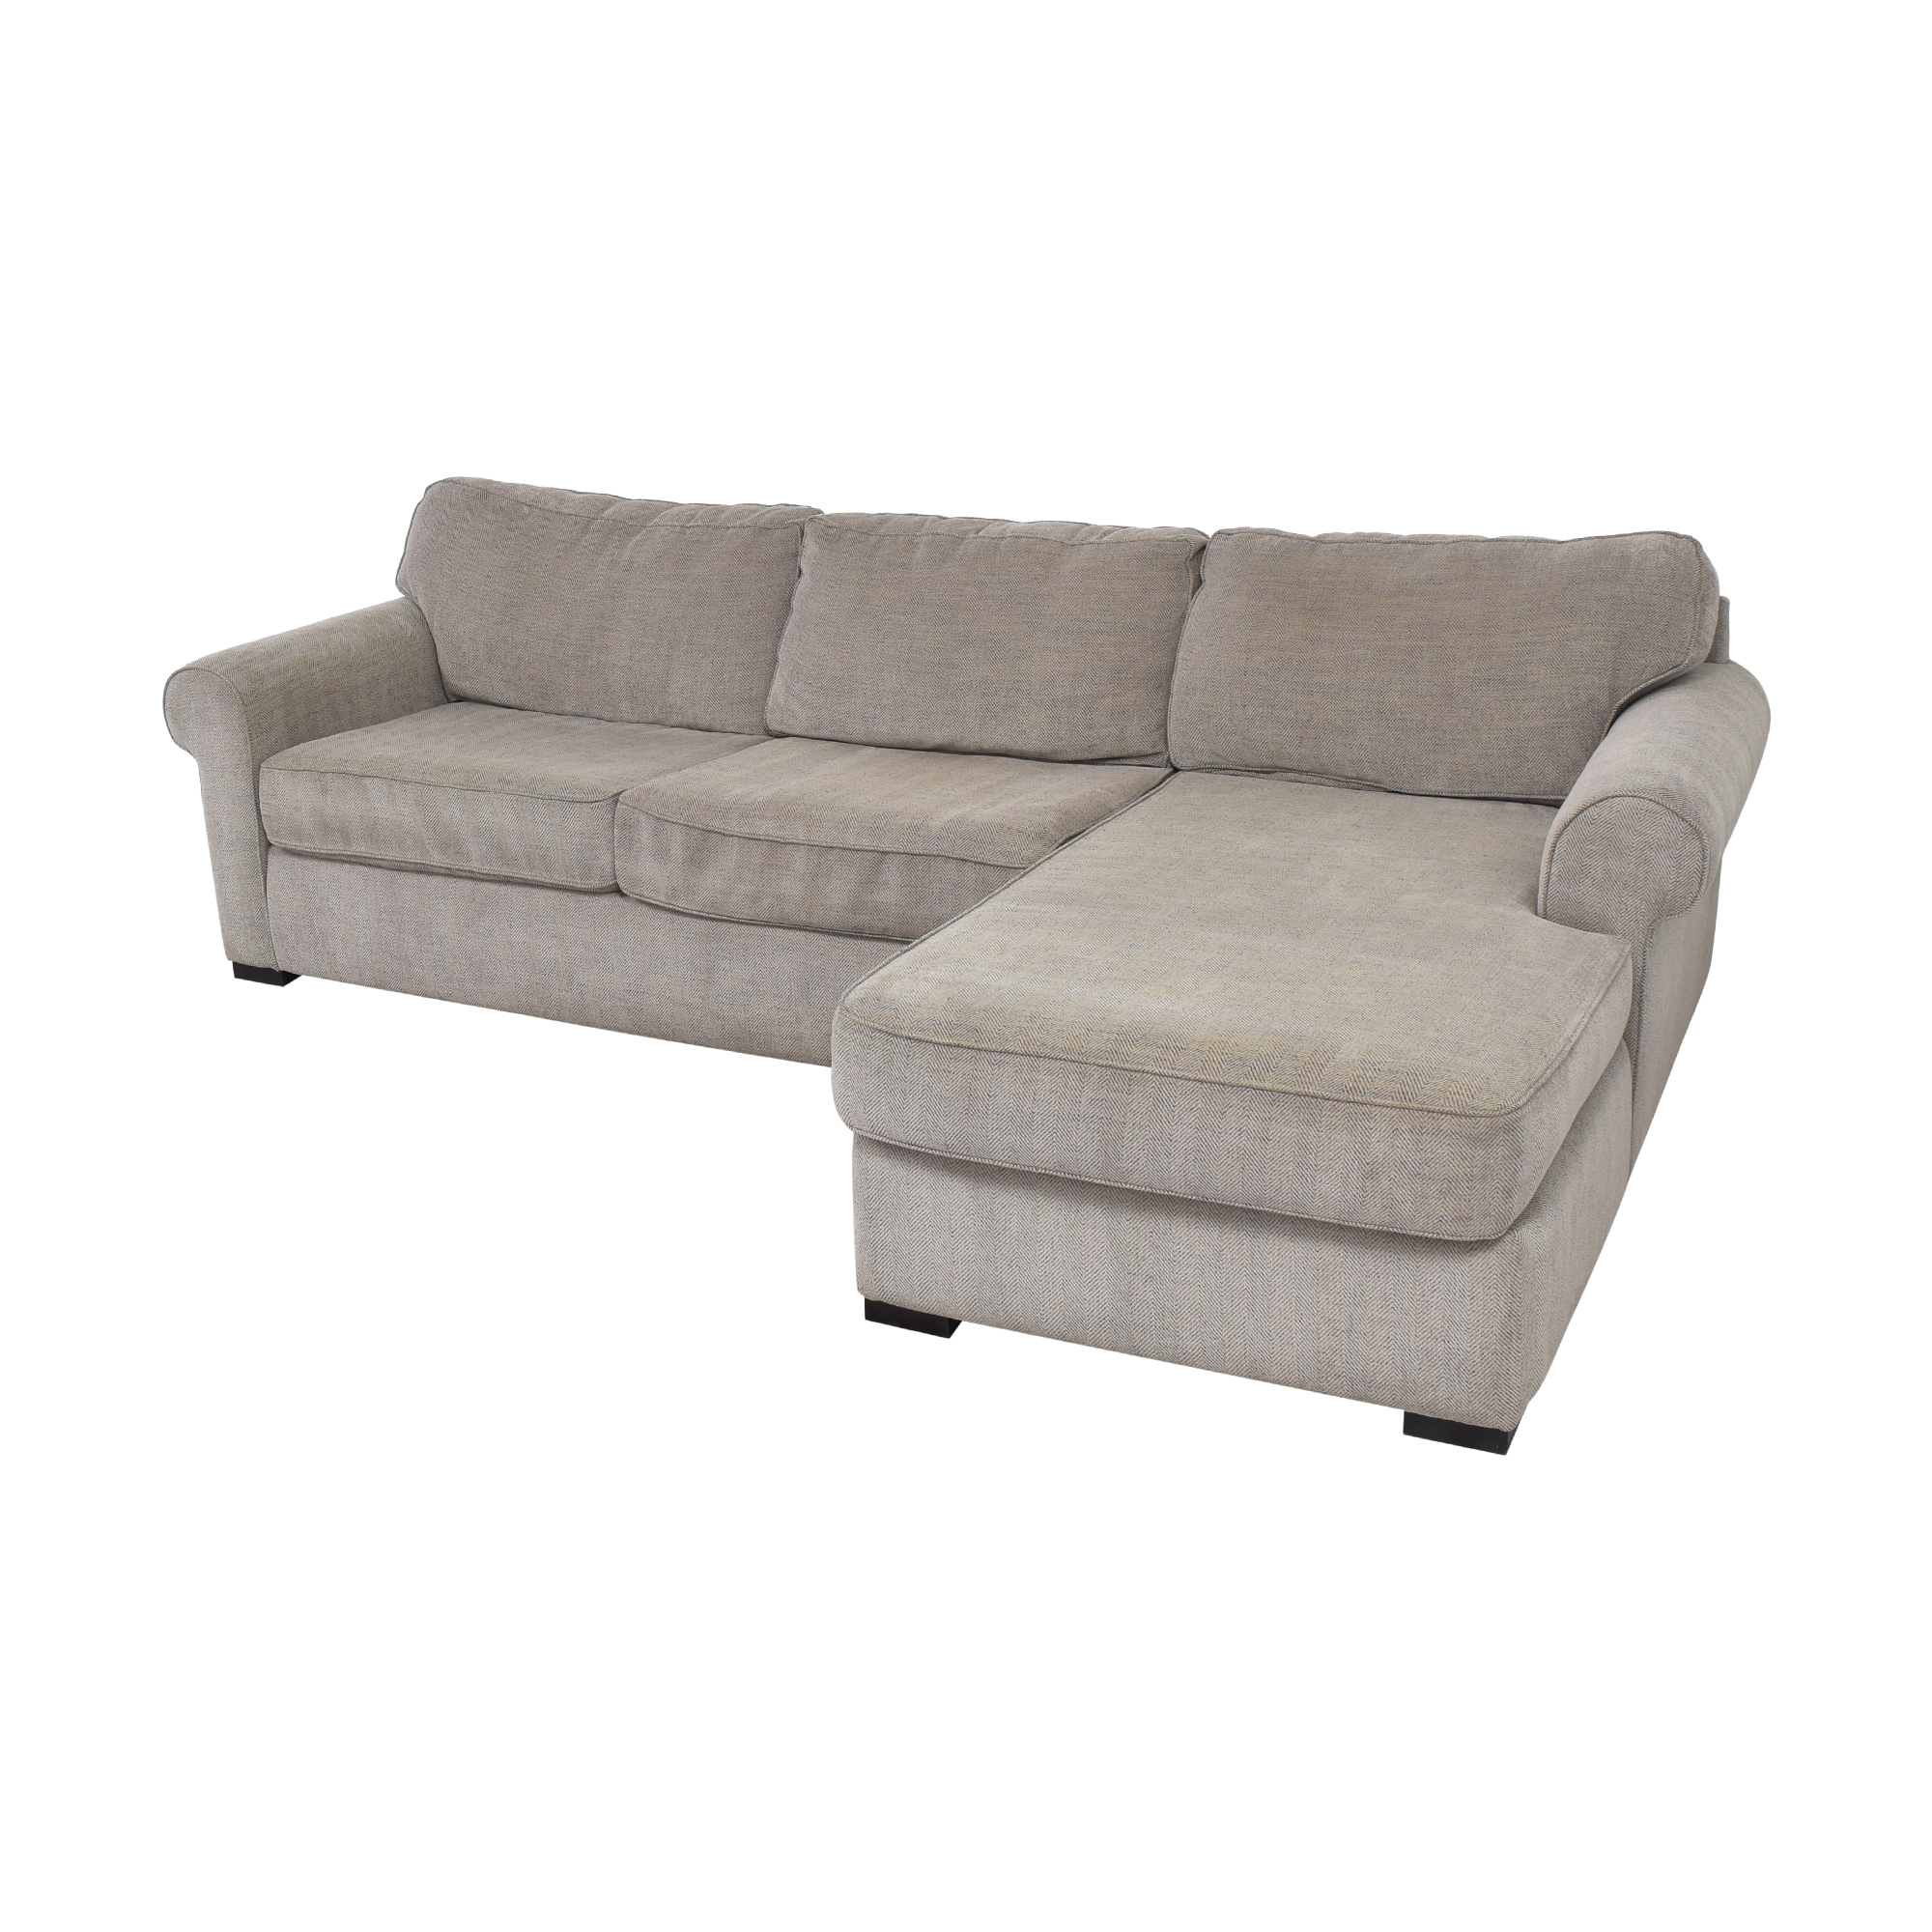 Raymour & Flanigan Raymour & Flanigan Kipling Two Piece Sectional Sofa gray